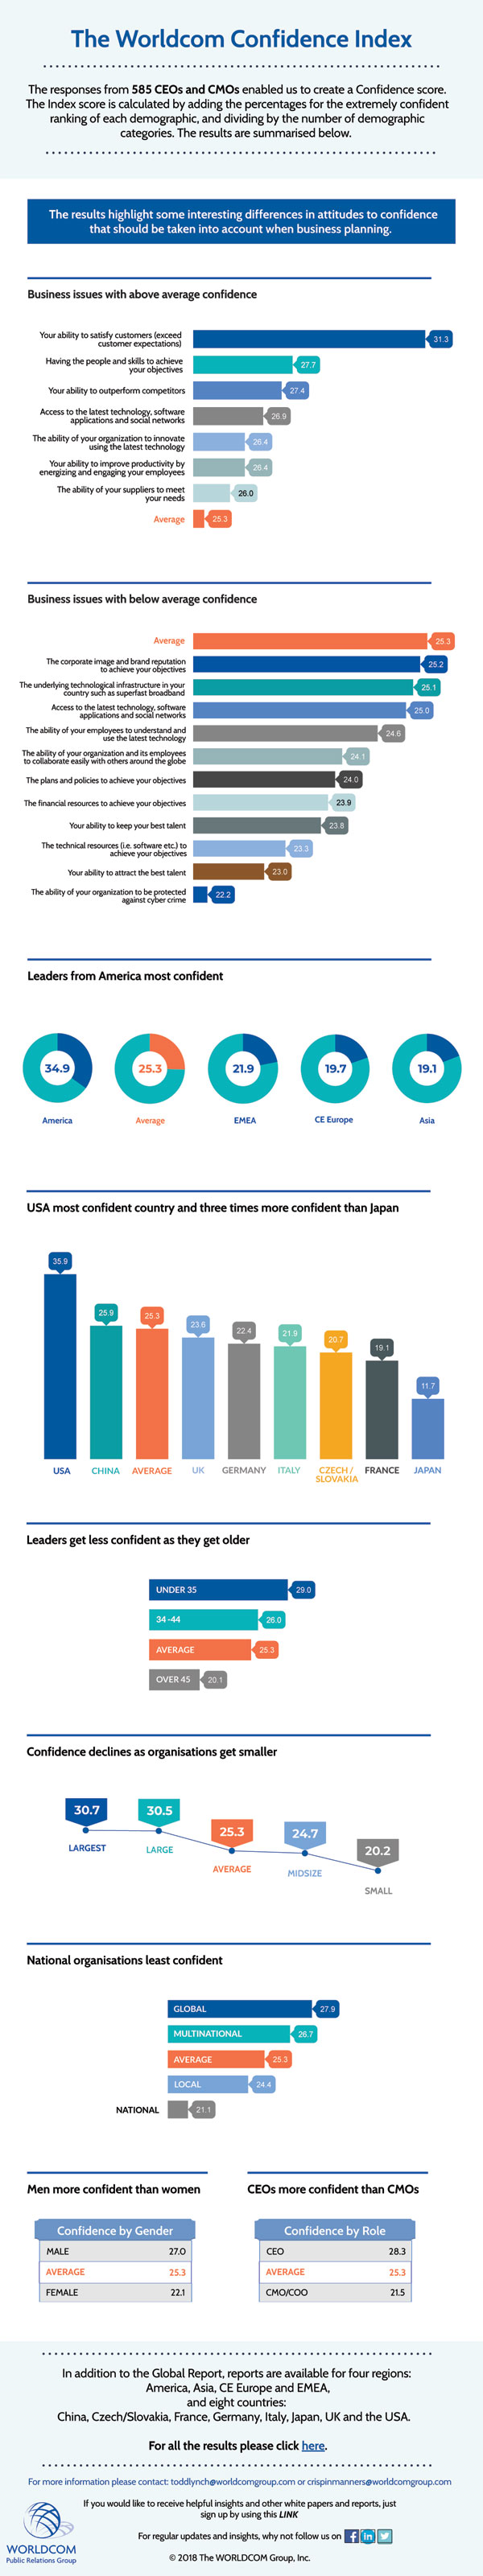 Worldcom 2018 confidence index